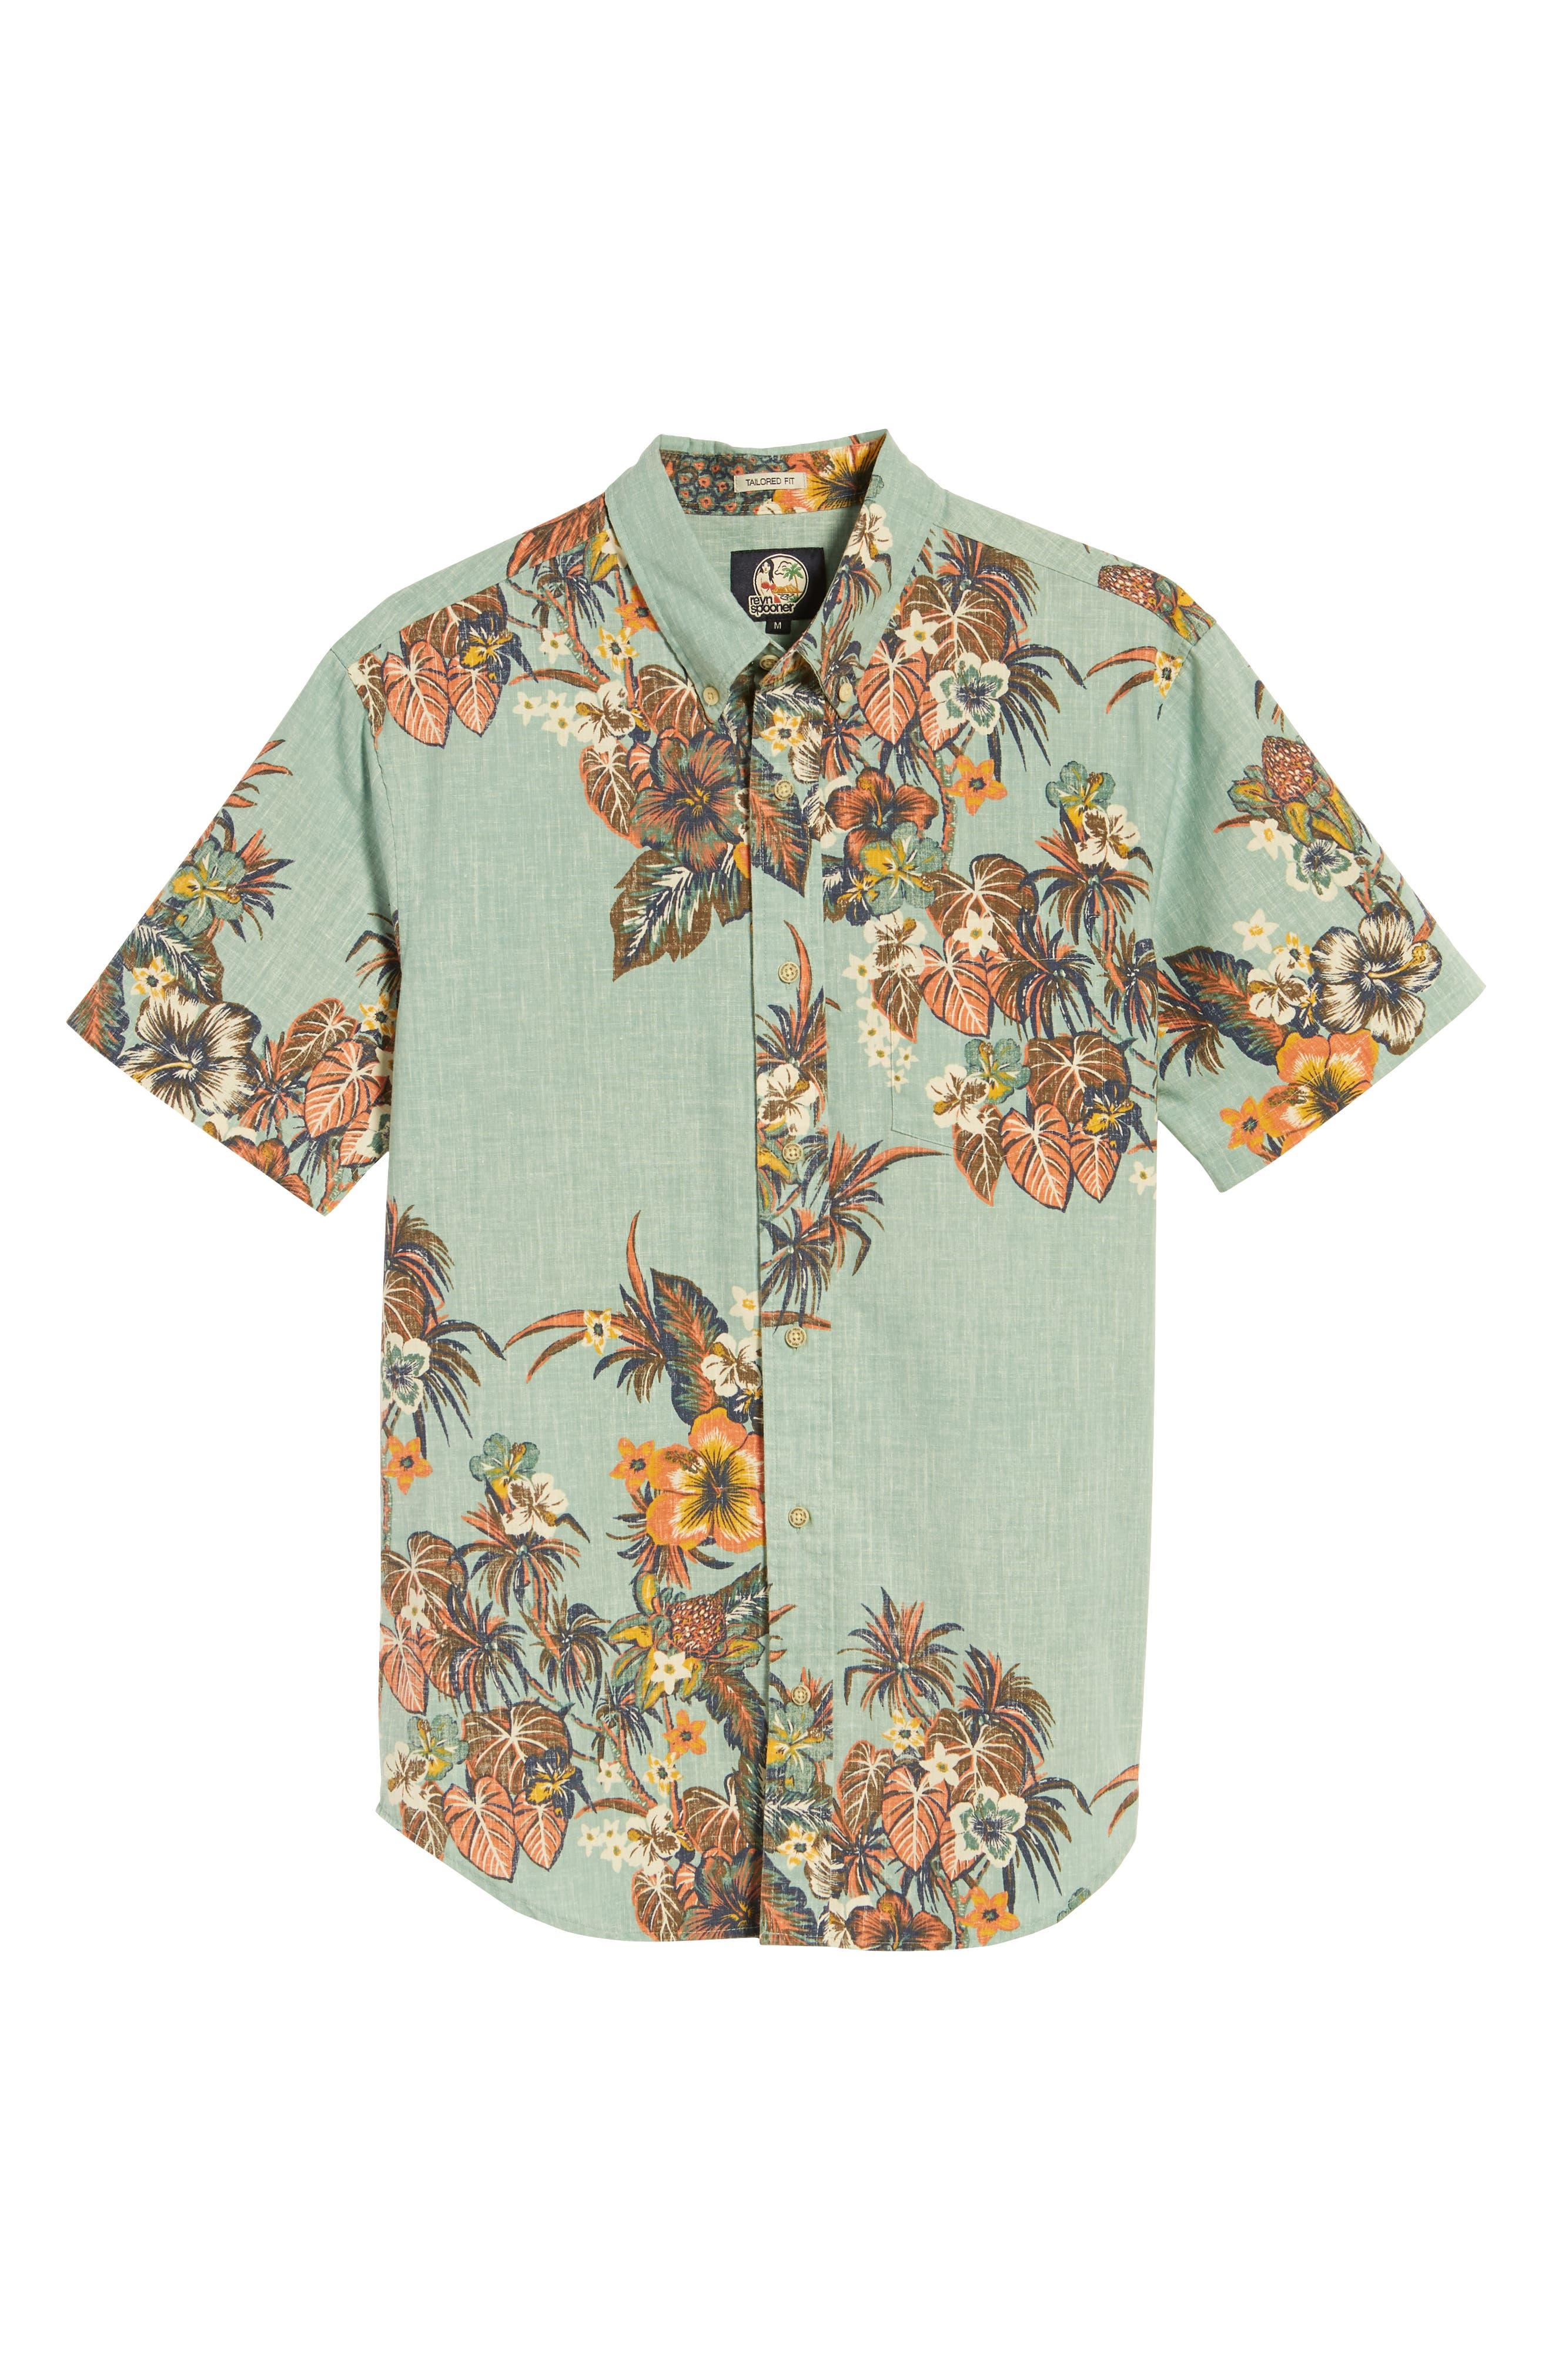 Pupas & Mai Tais Regular Fit Sport Shirt,                             Alternate thumbnail 6, color,                             Blue